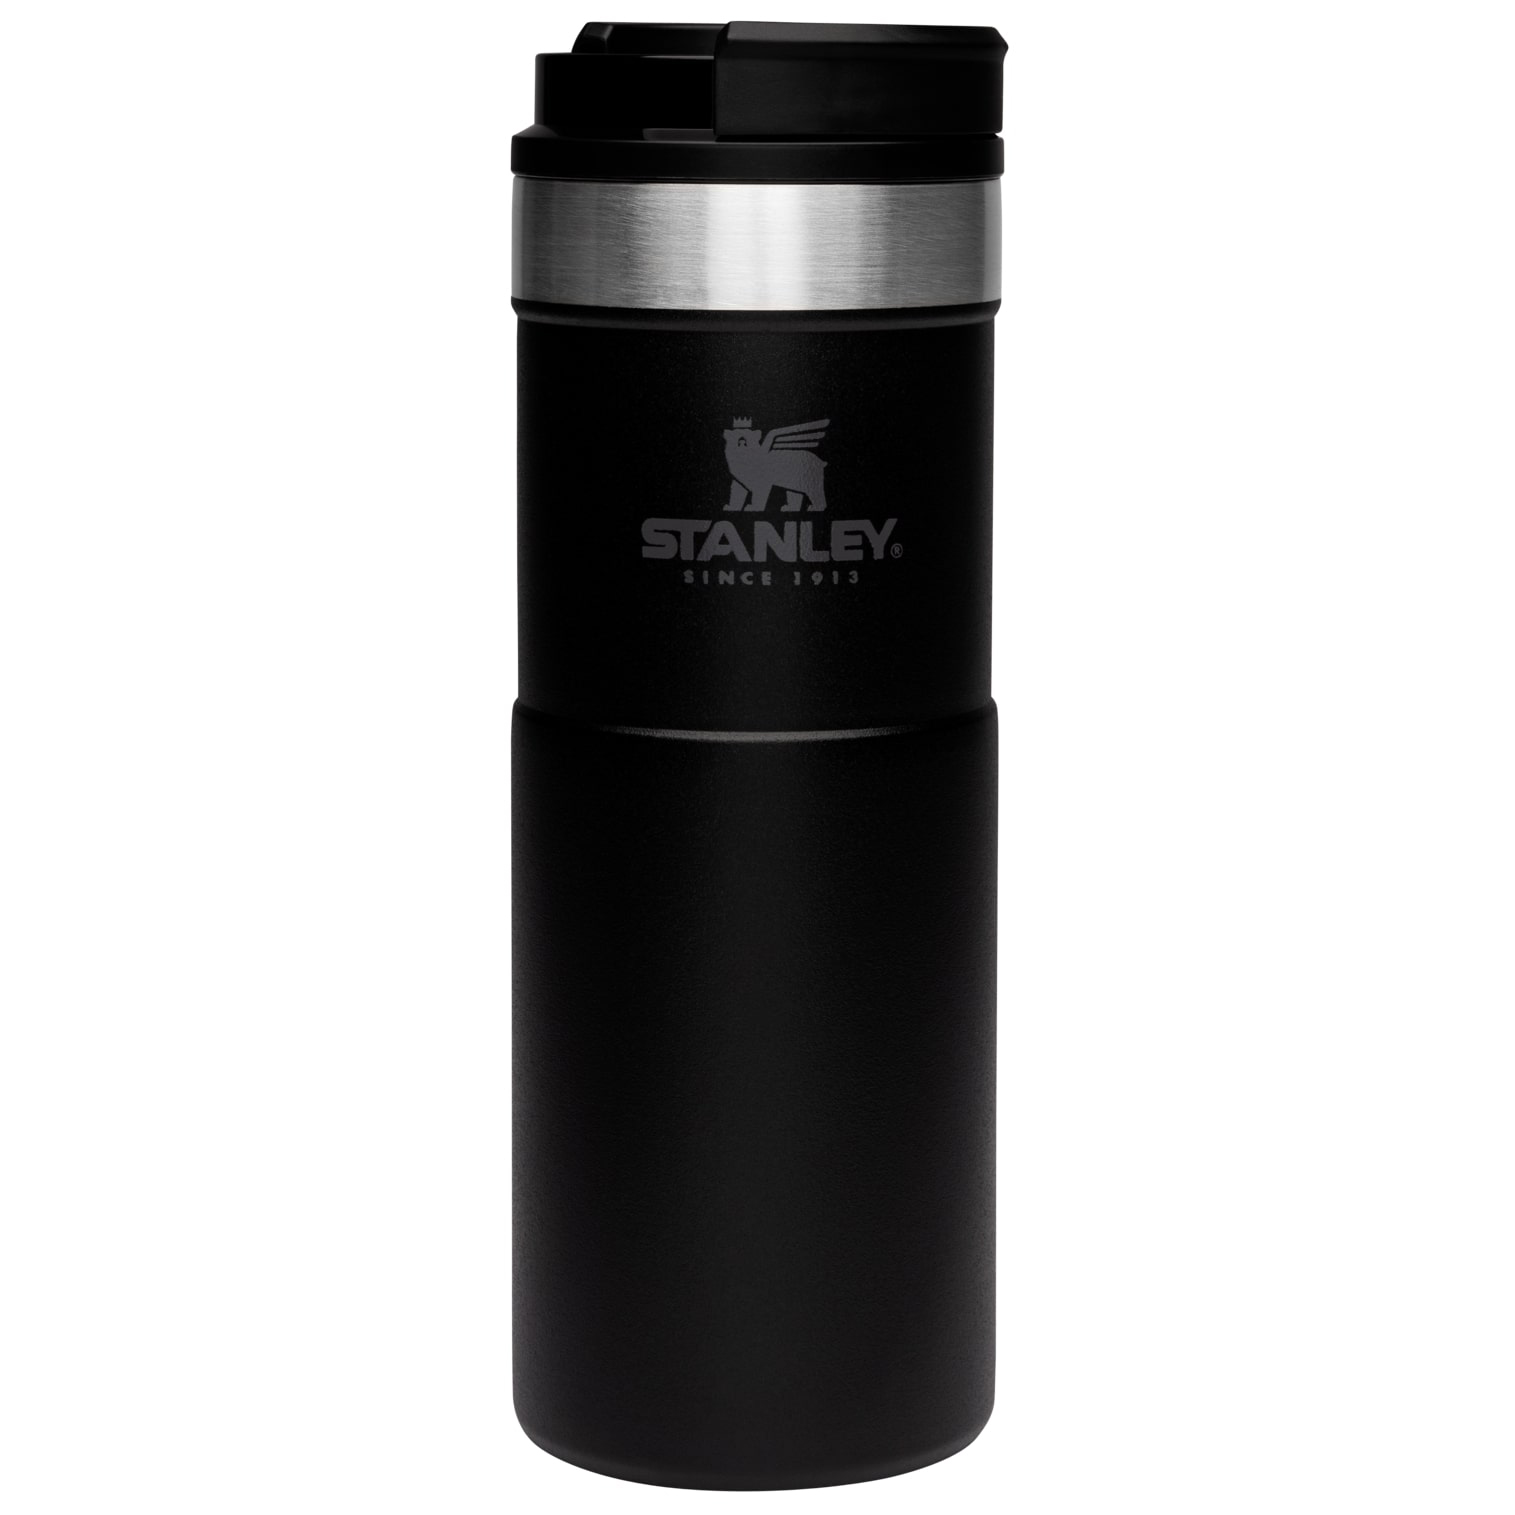 Stanley Classic The NeverLeak Travel Mug 16oz - 0.47L - Black